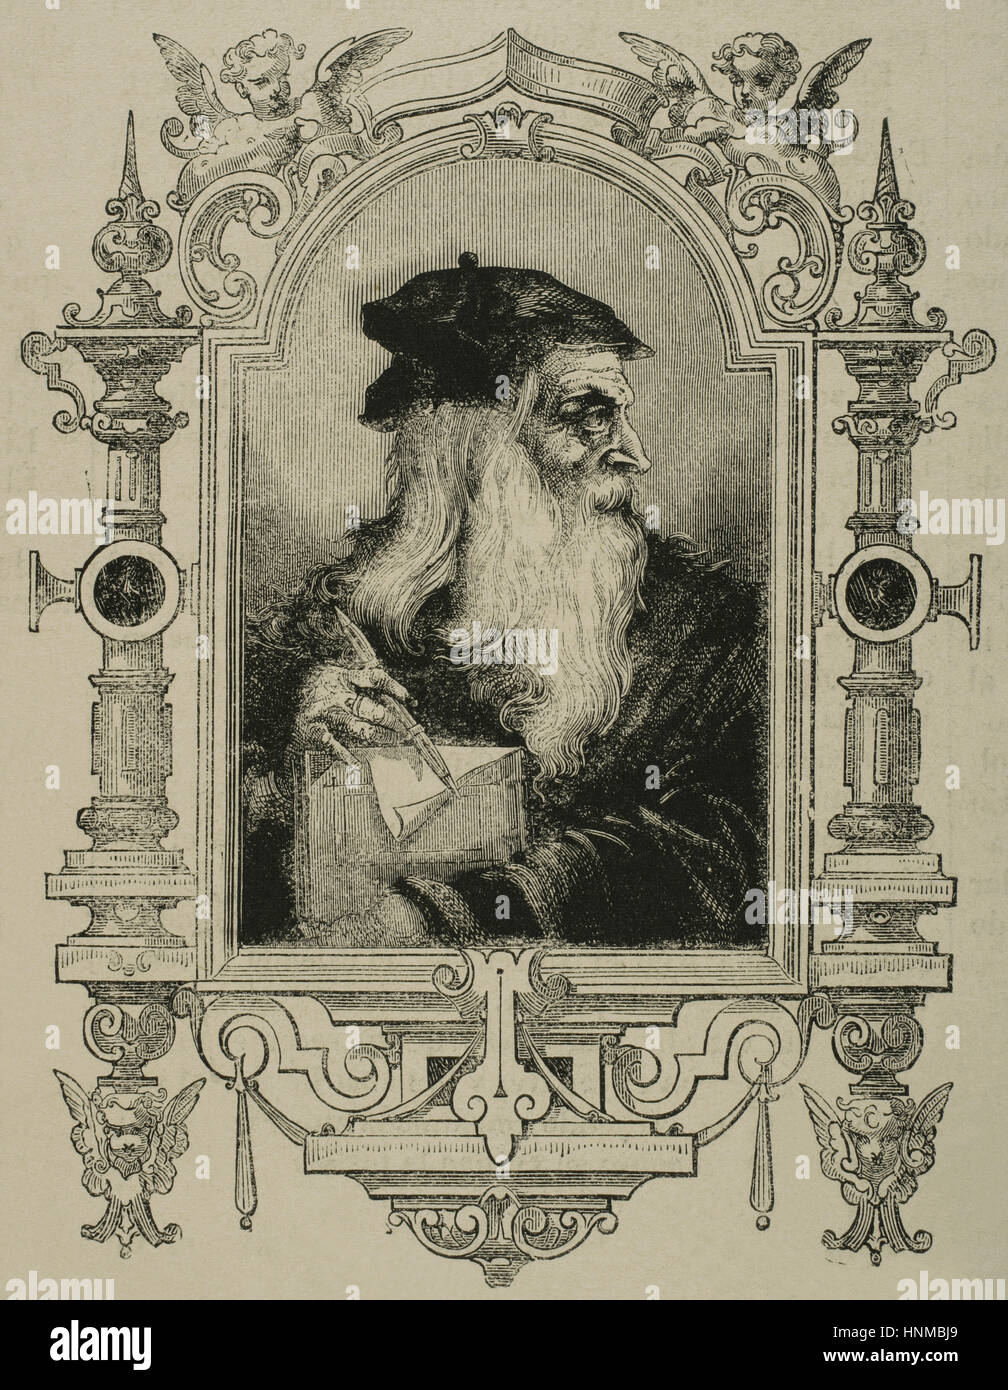 Leonardo da Vinci (1452-1519). Italienischer Universalgelehrter ...